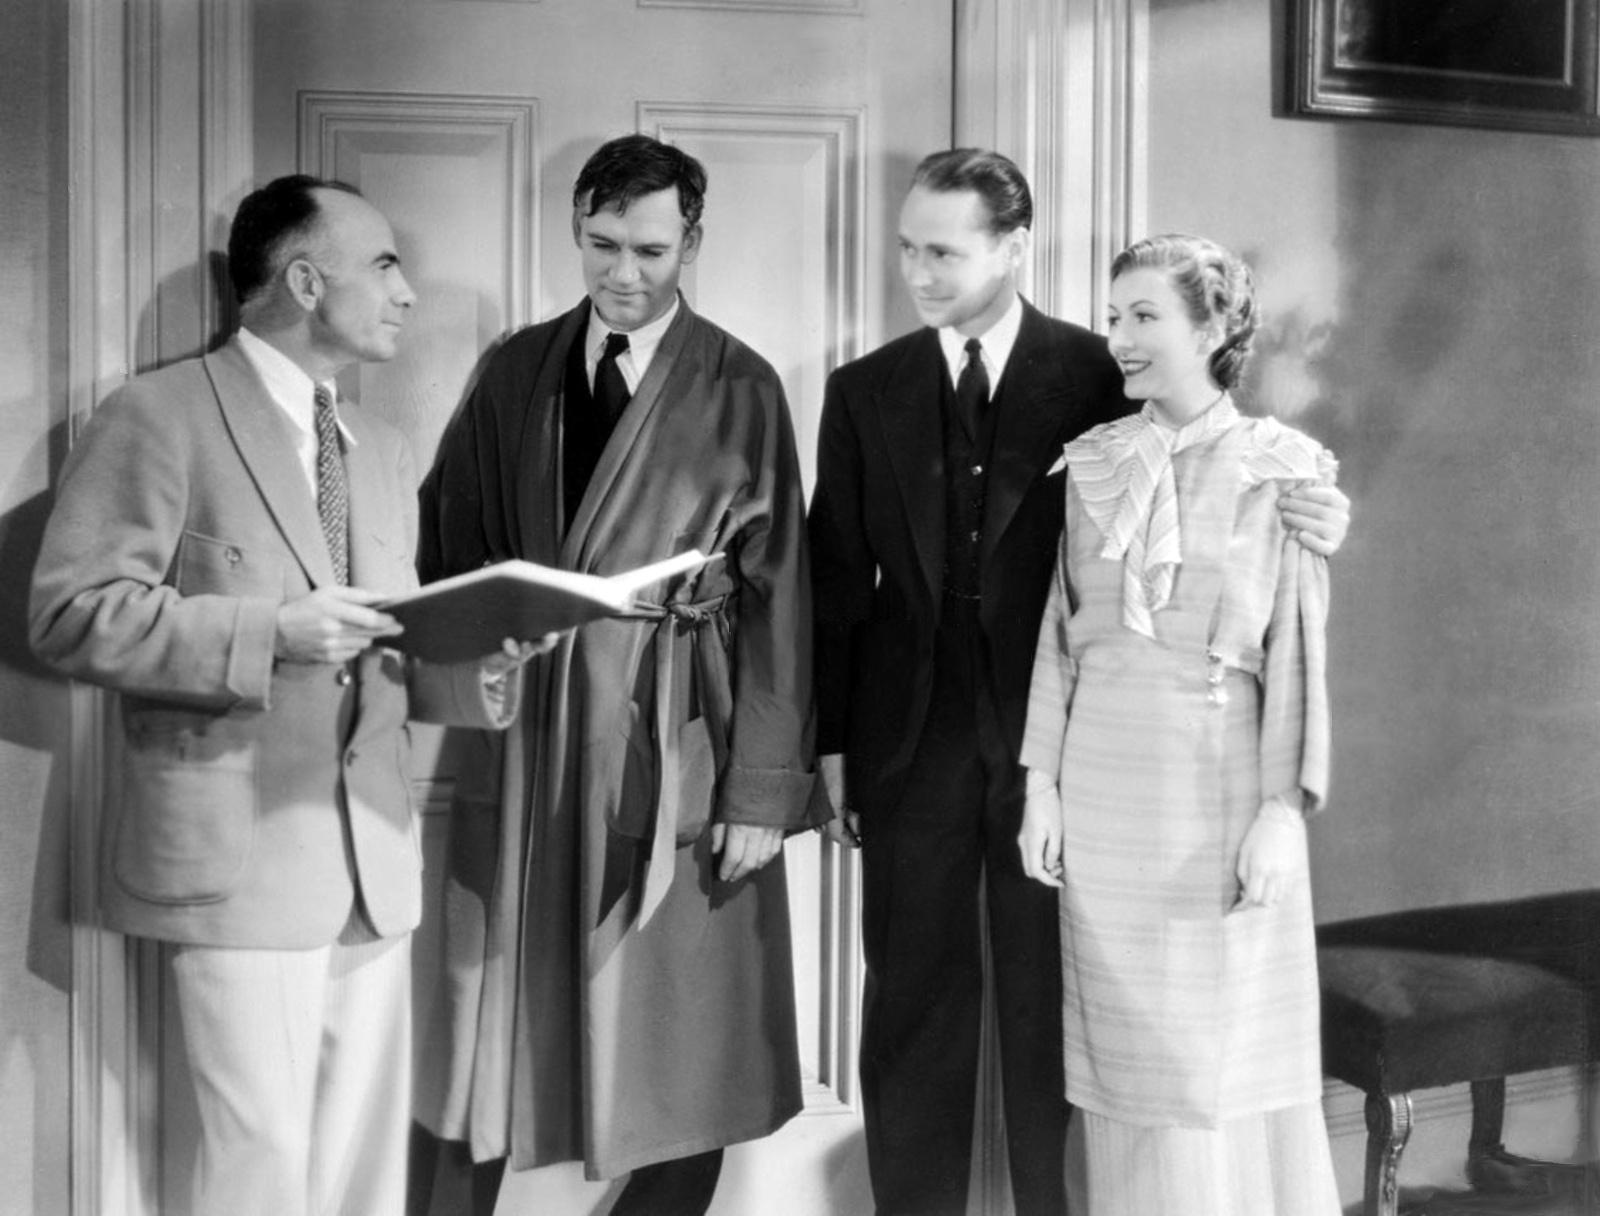 (L to R) Gregory La Cava,Walter Huston,Franchot Tone,Karen Morley.